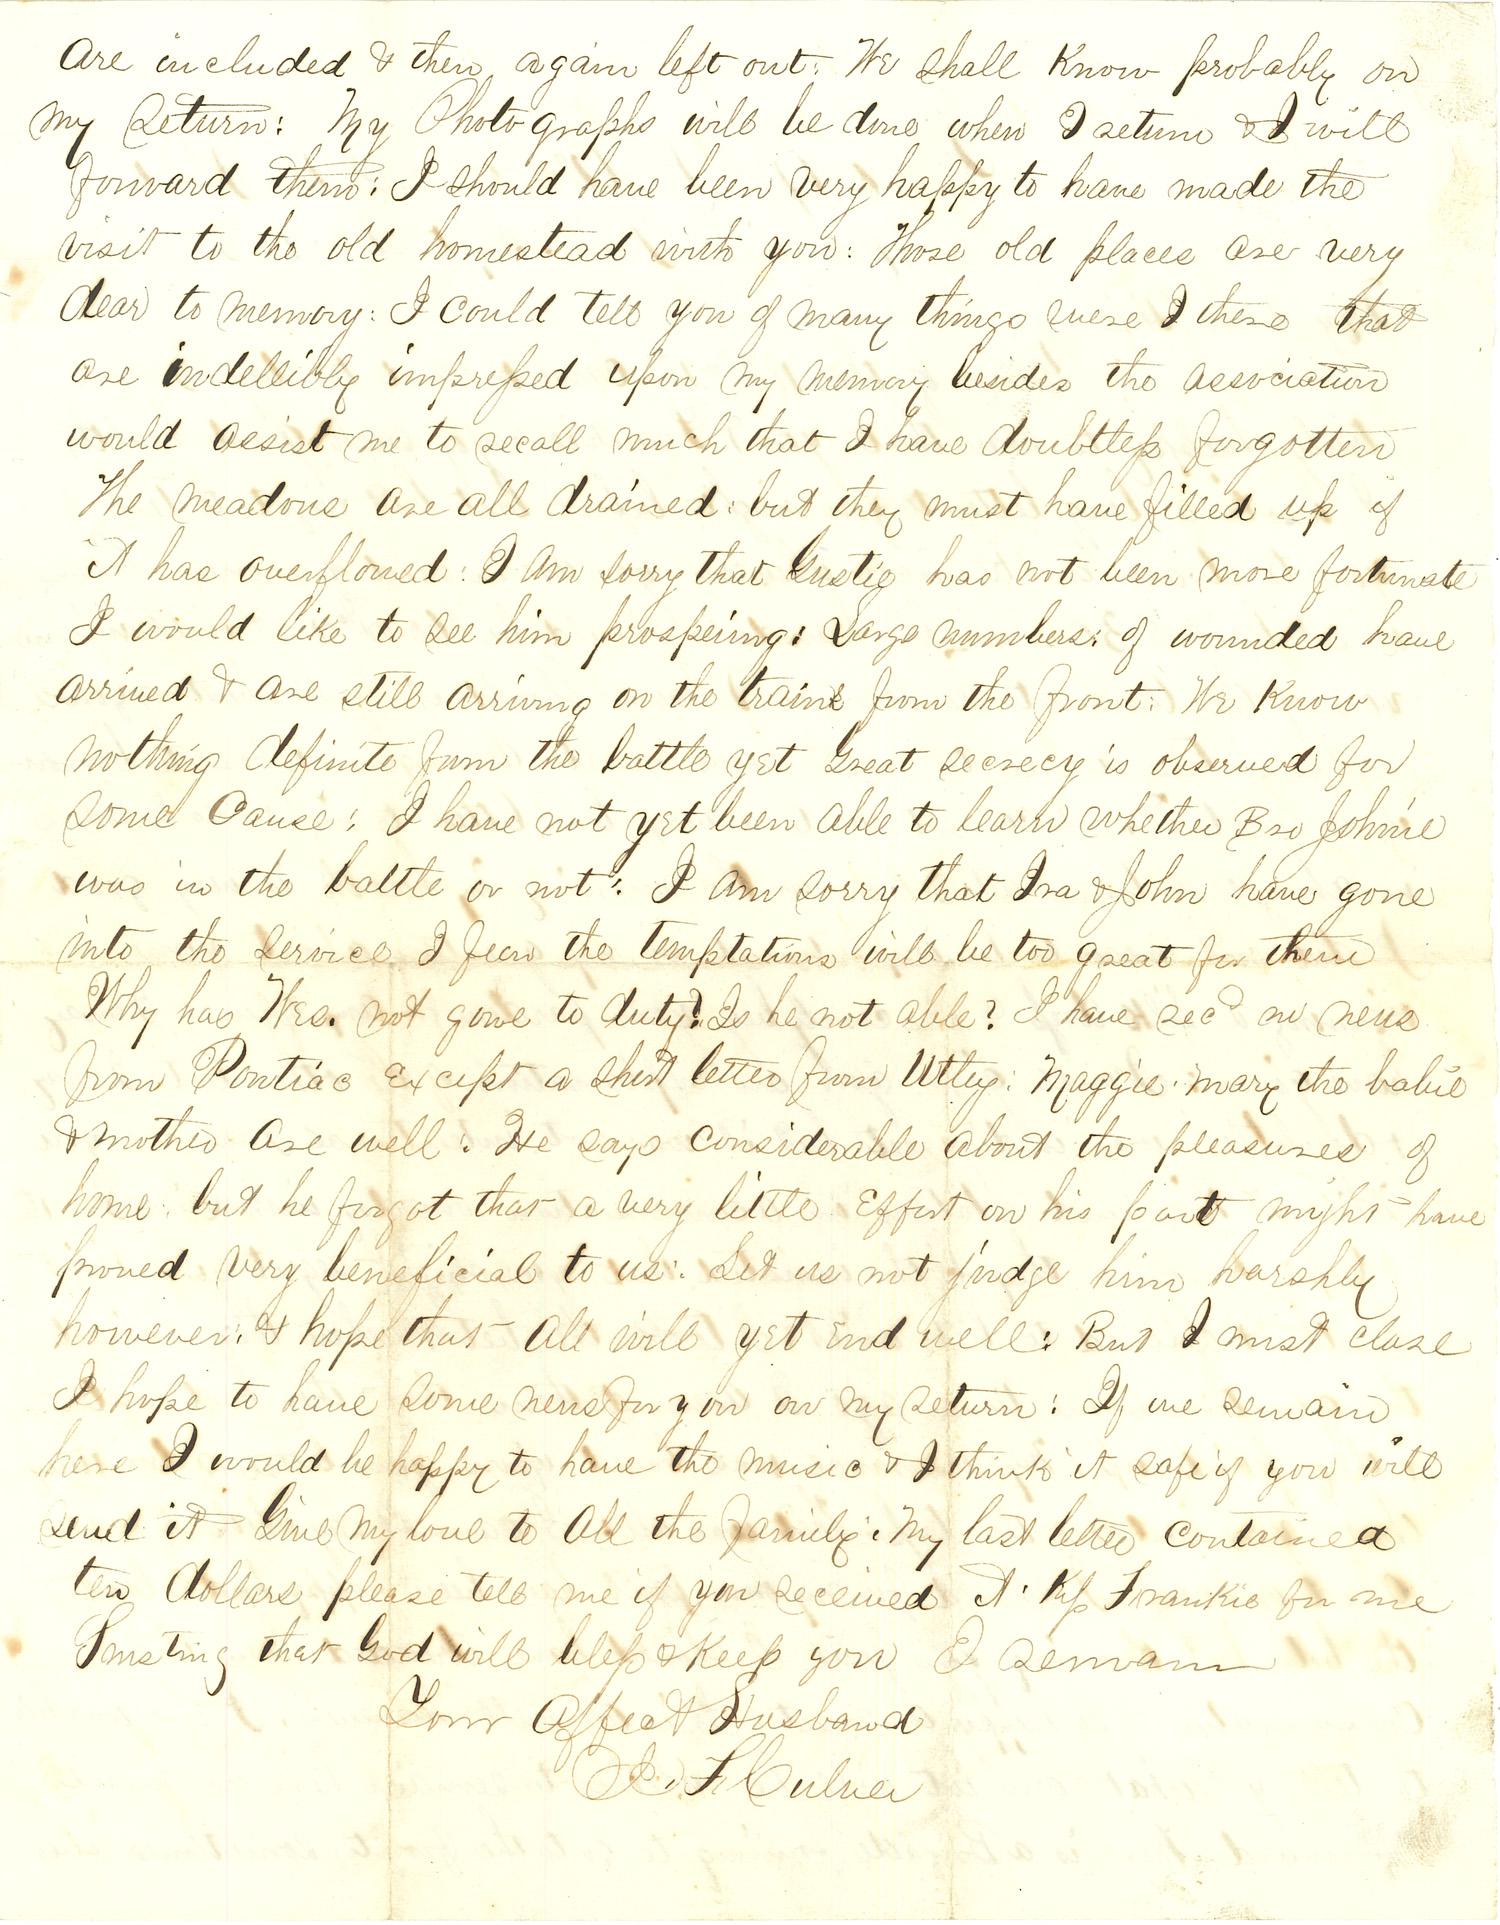 Joseph Culver Letter, September 24, 1863, Page 2